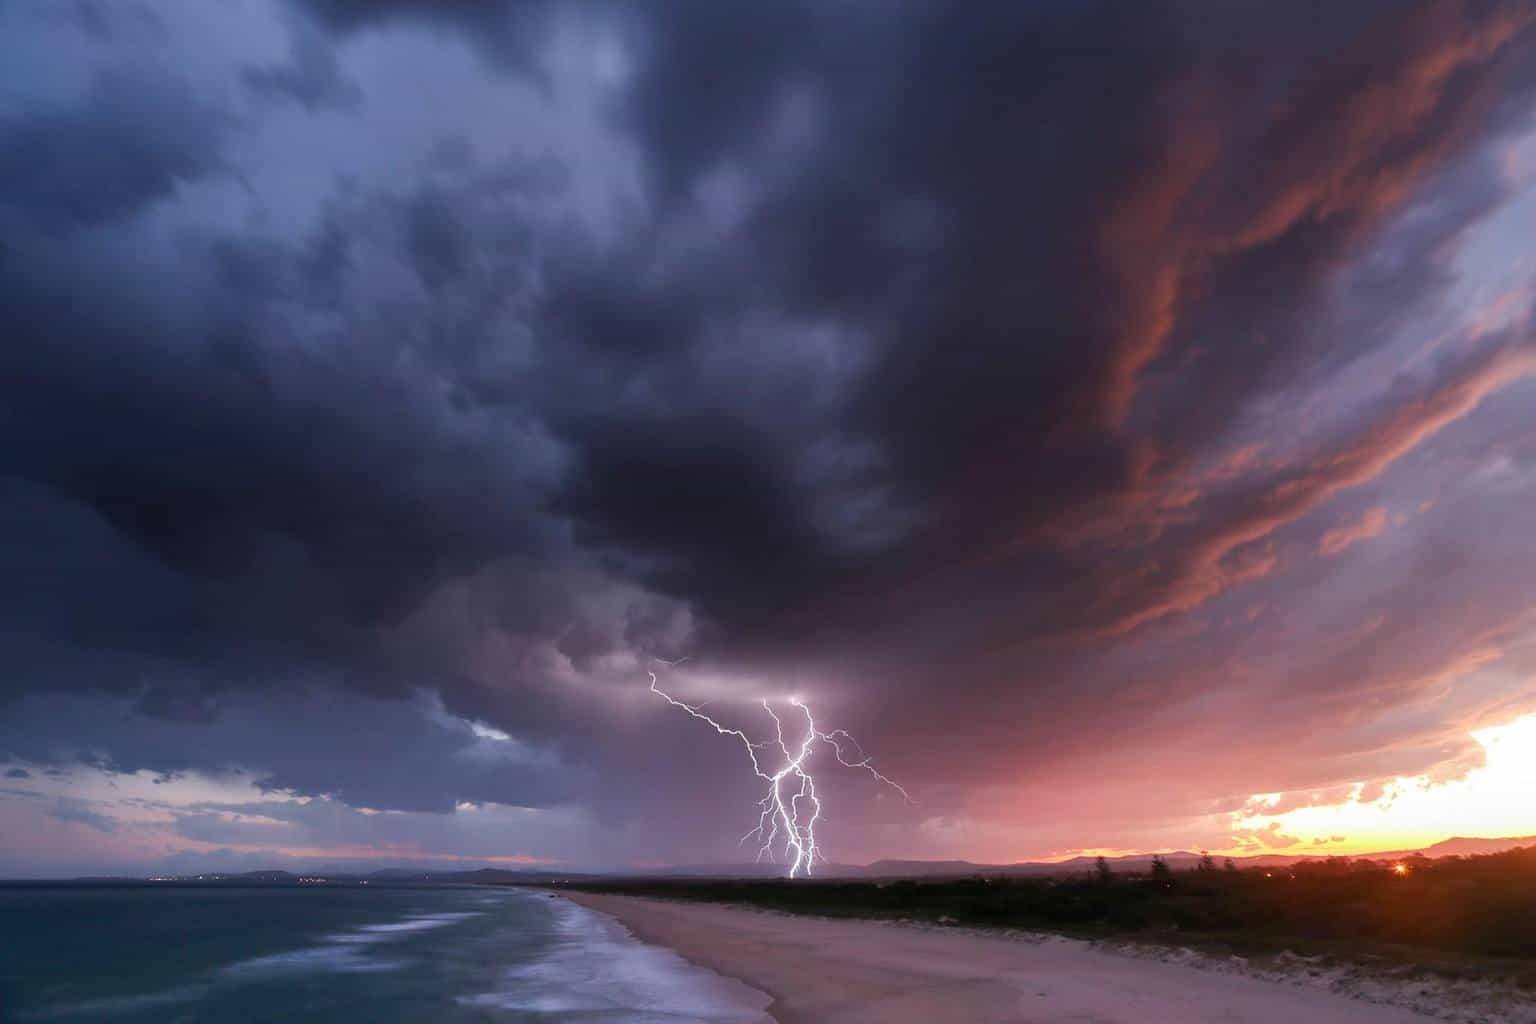 17-09-15 Red Rock NSW, Australia